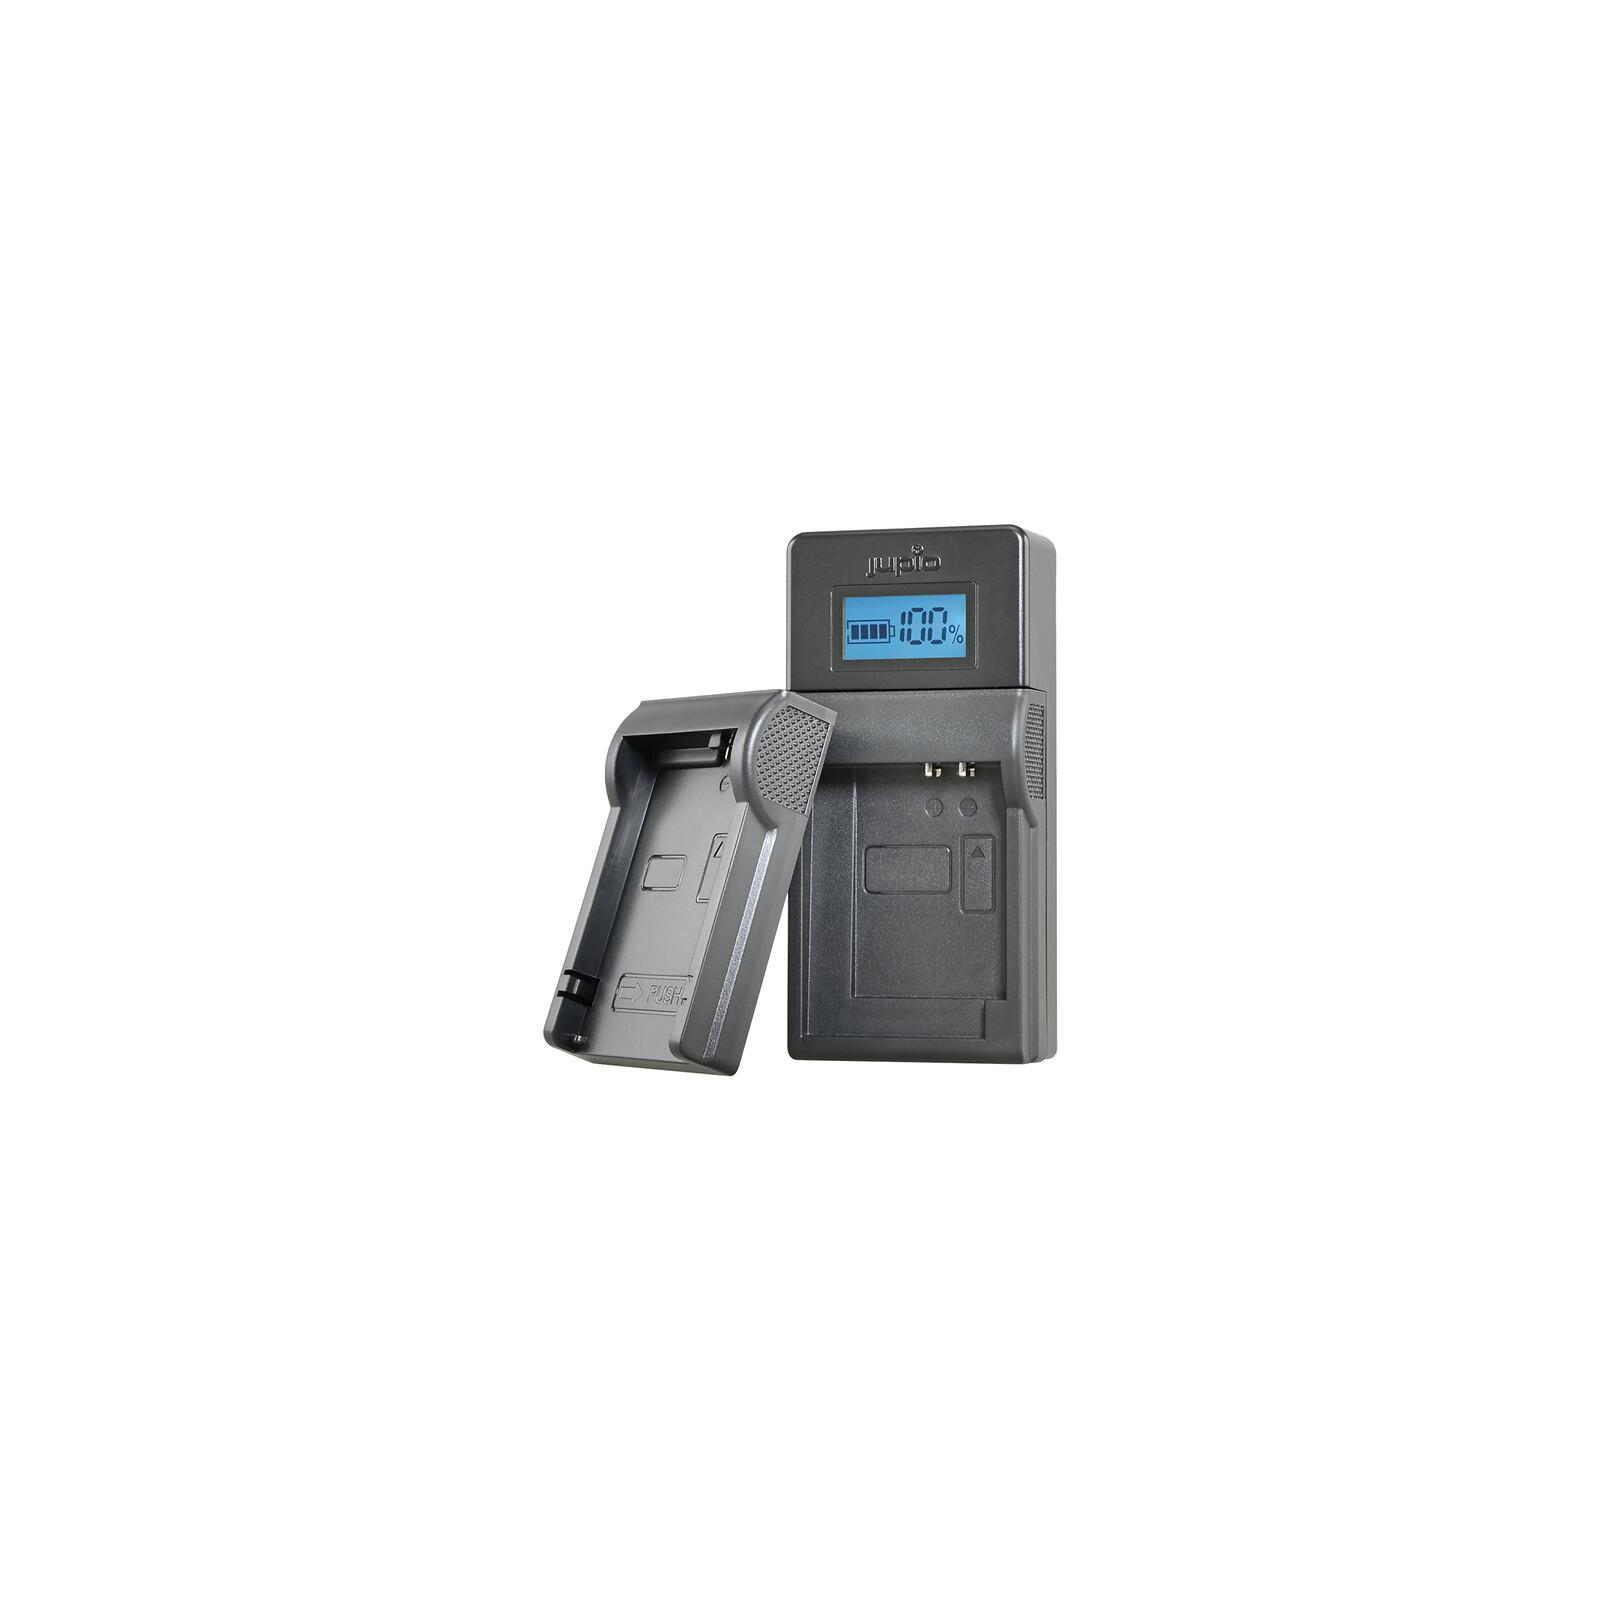 Jupio Brand Charger for Nikon, Fuji, Olympus 7.2-8.4V